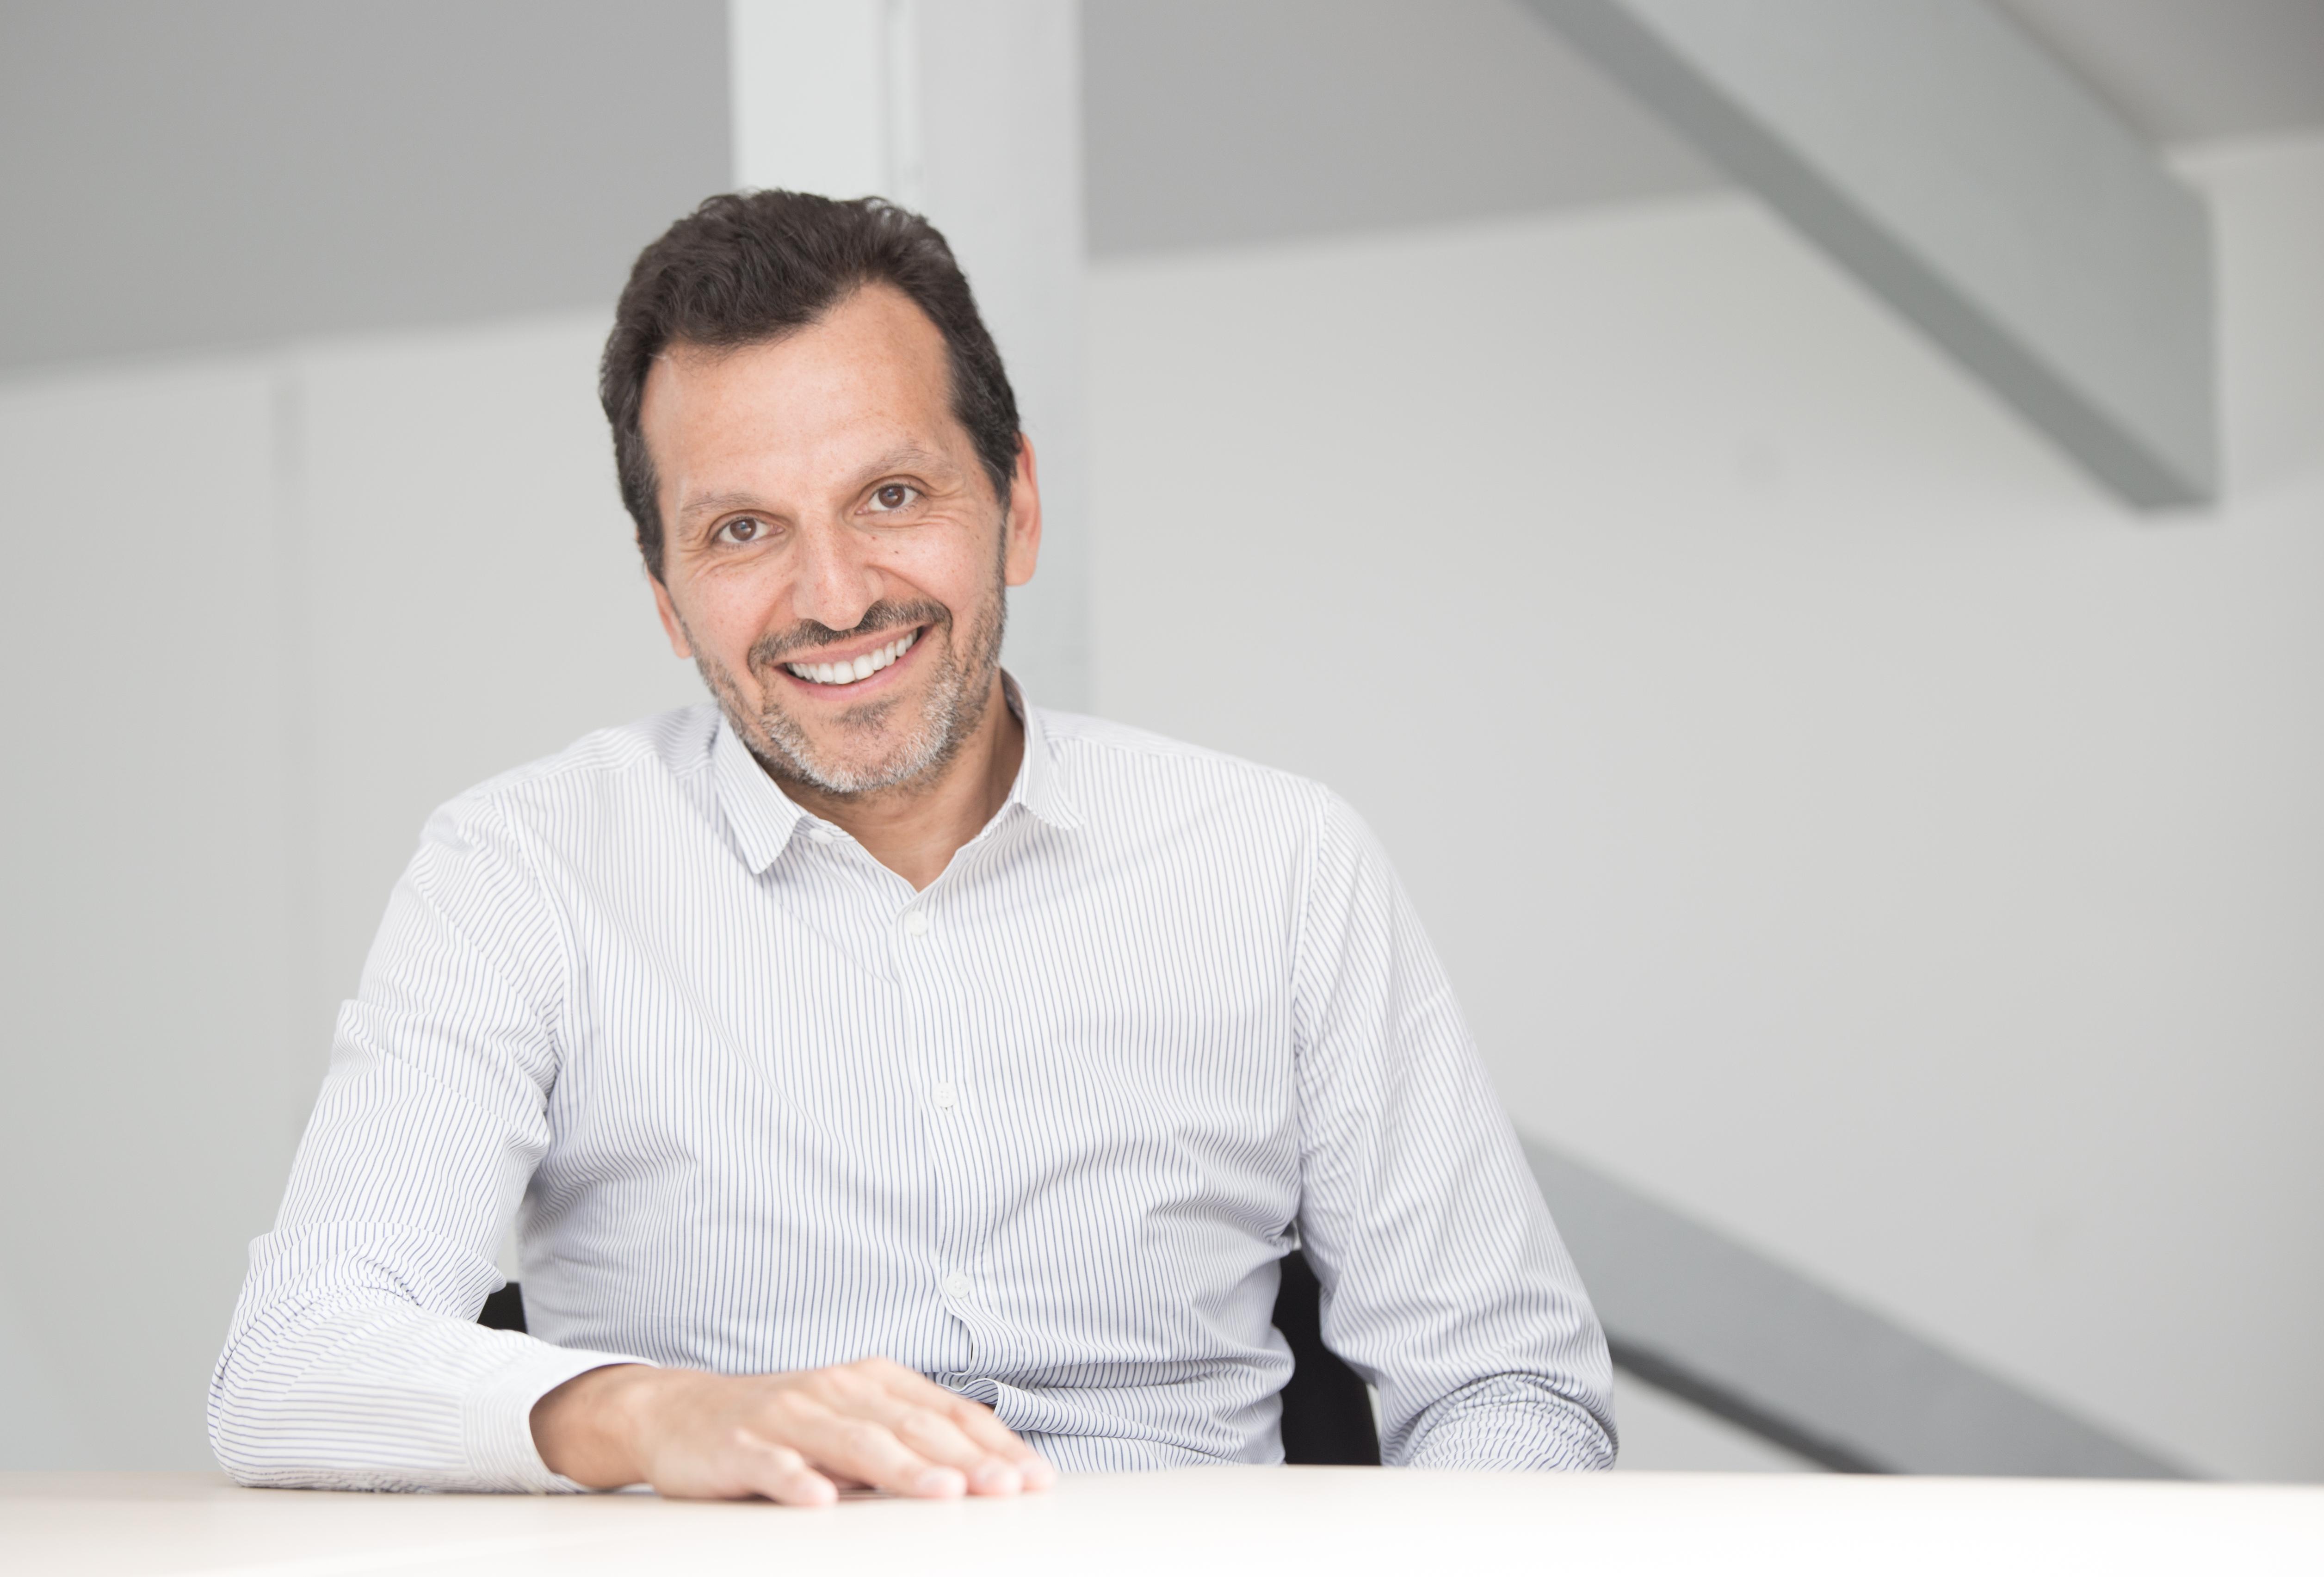 Toluna CEO Frédèric-Charles Petit